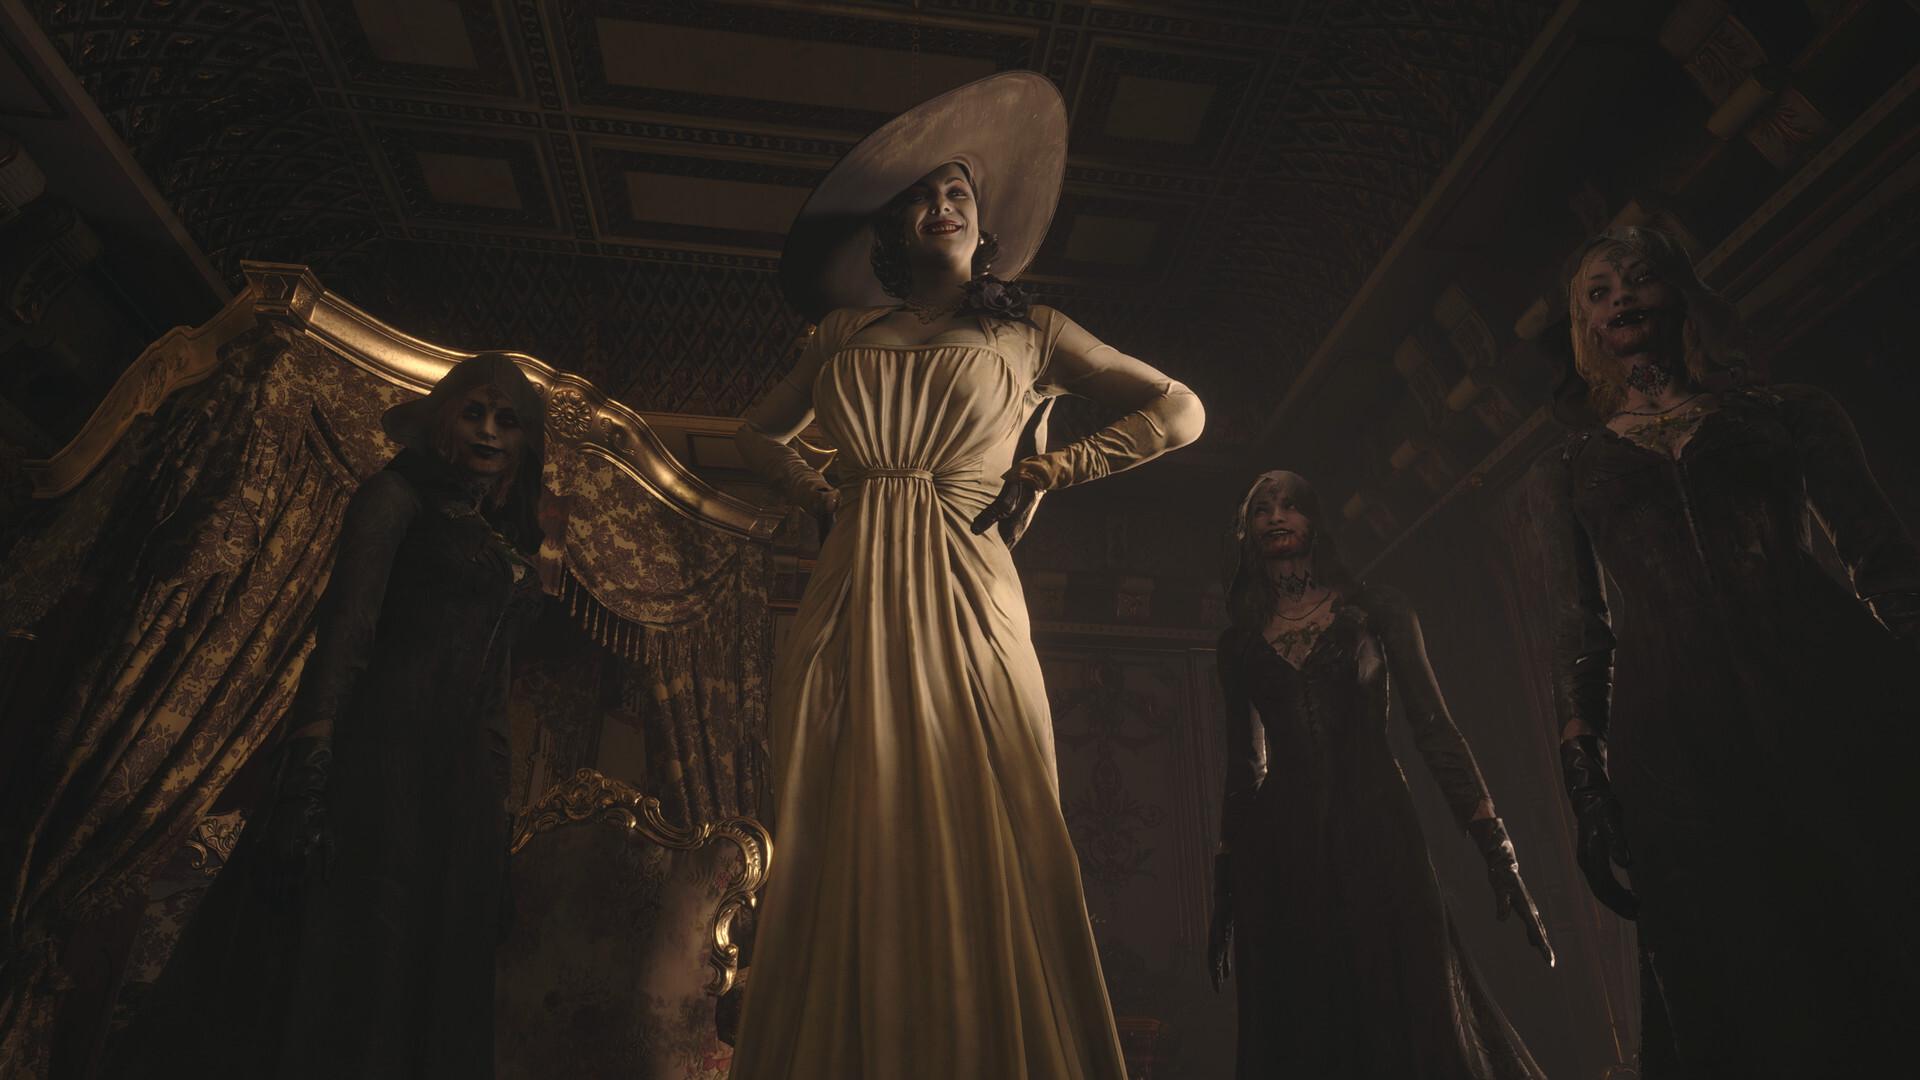 Resident Evil 8 villain Lady Dimitrescu